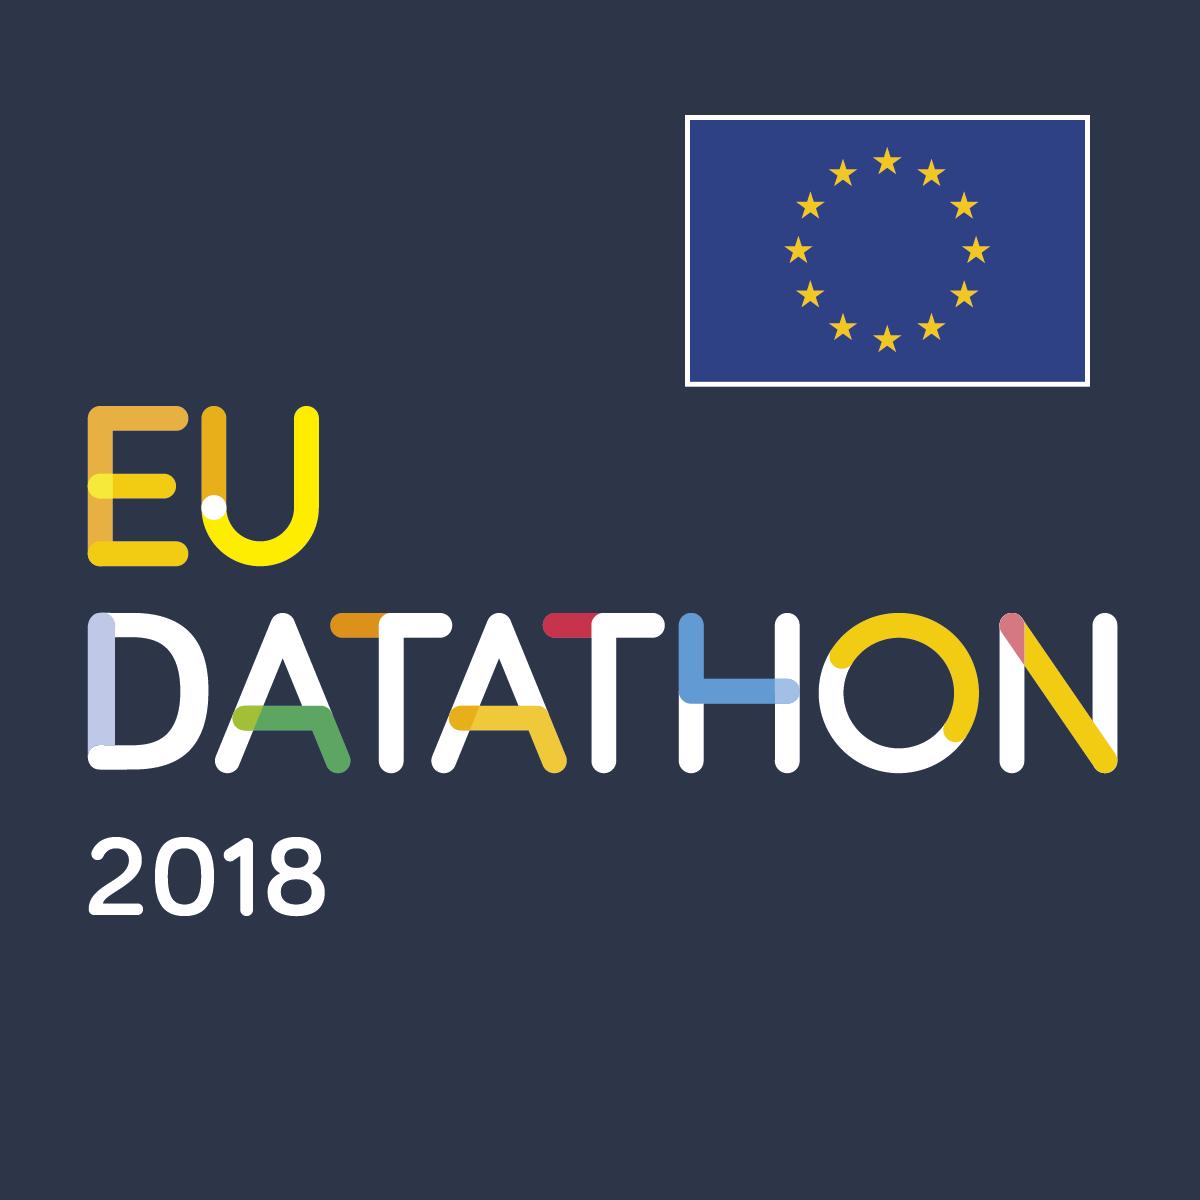 EU Datathon 2018 squared image black